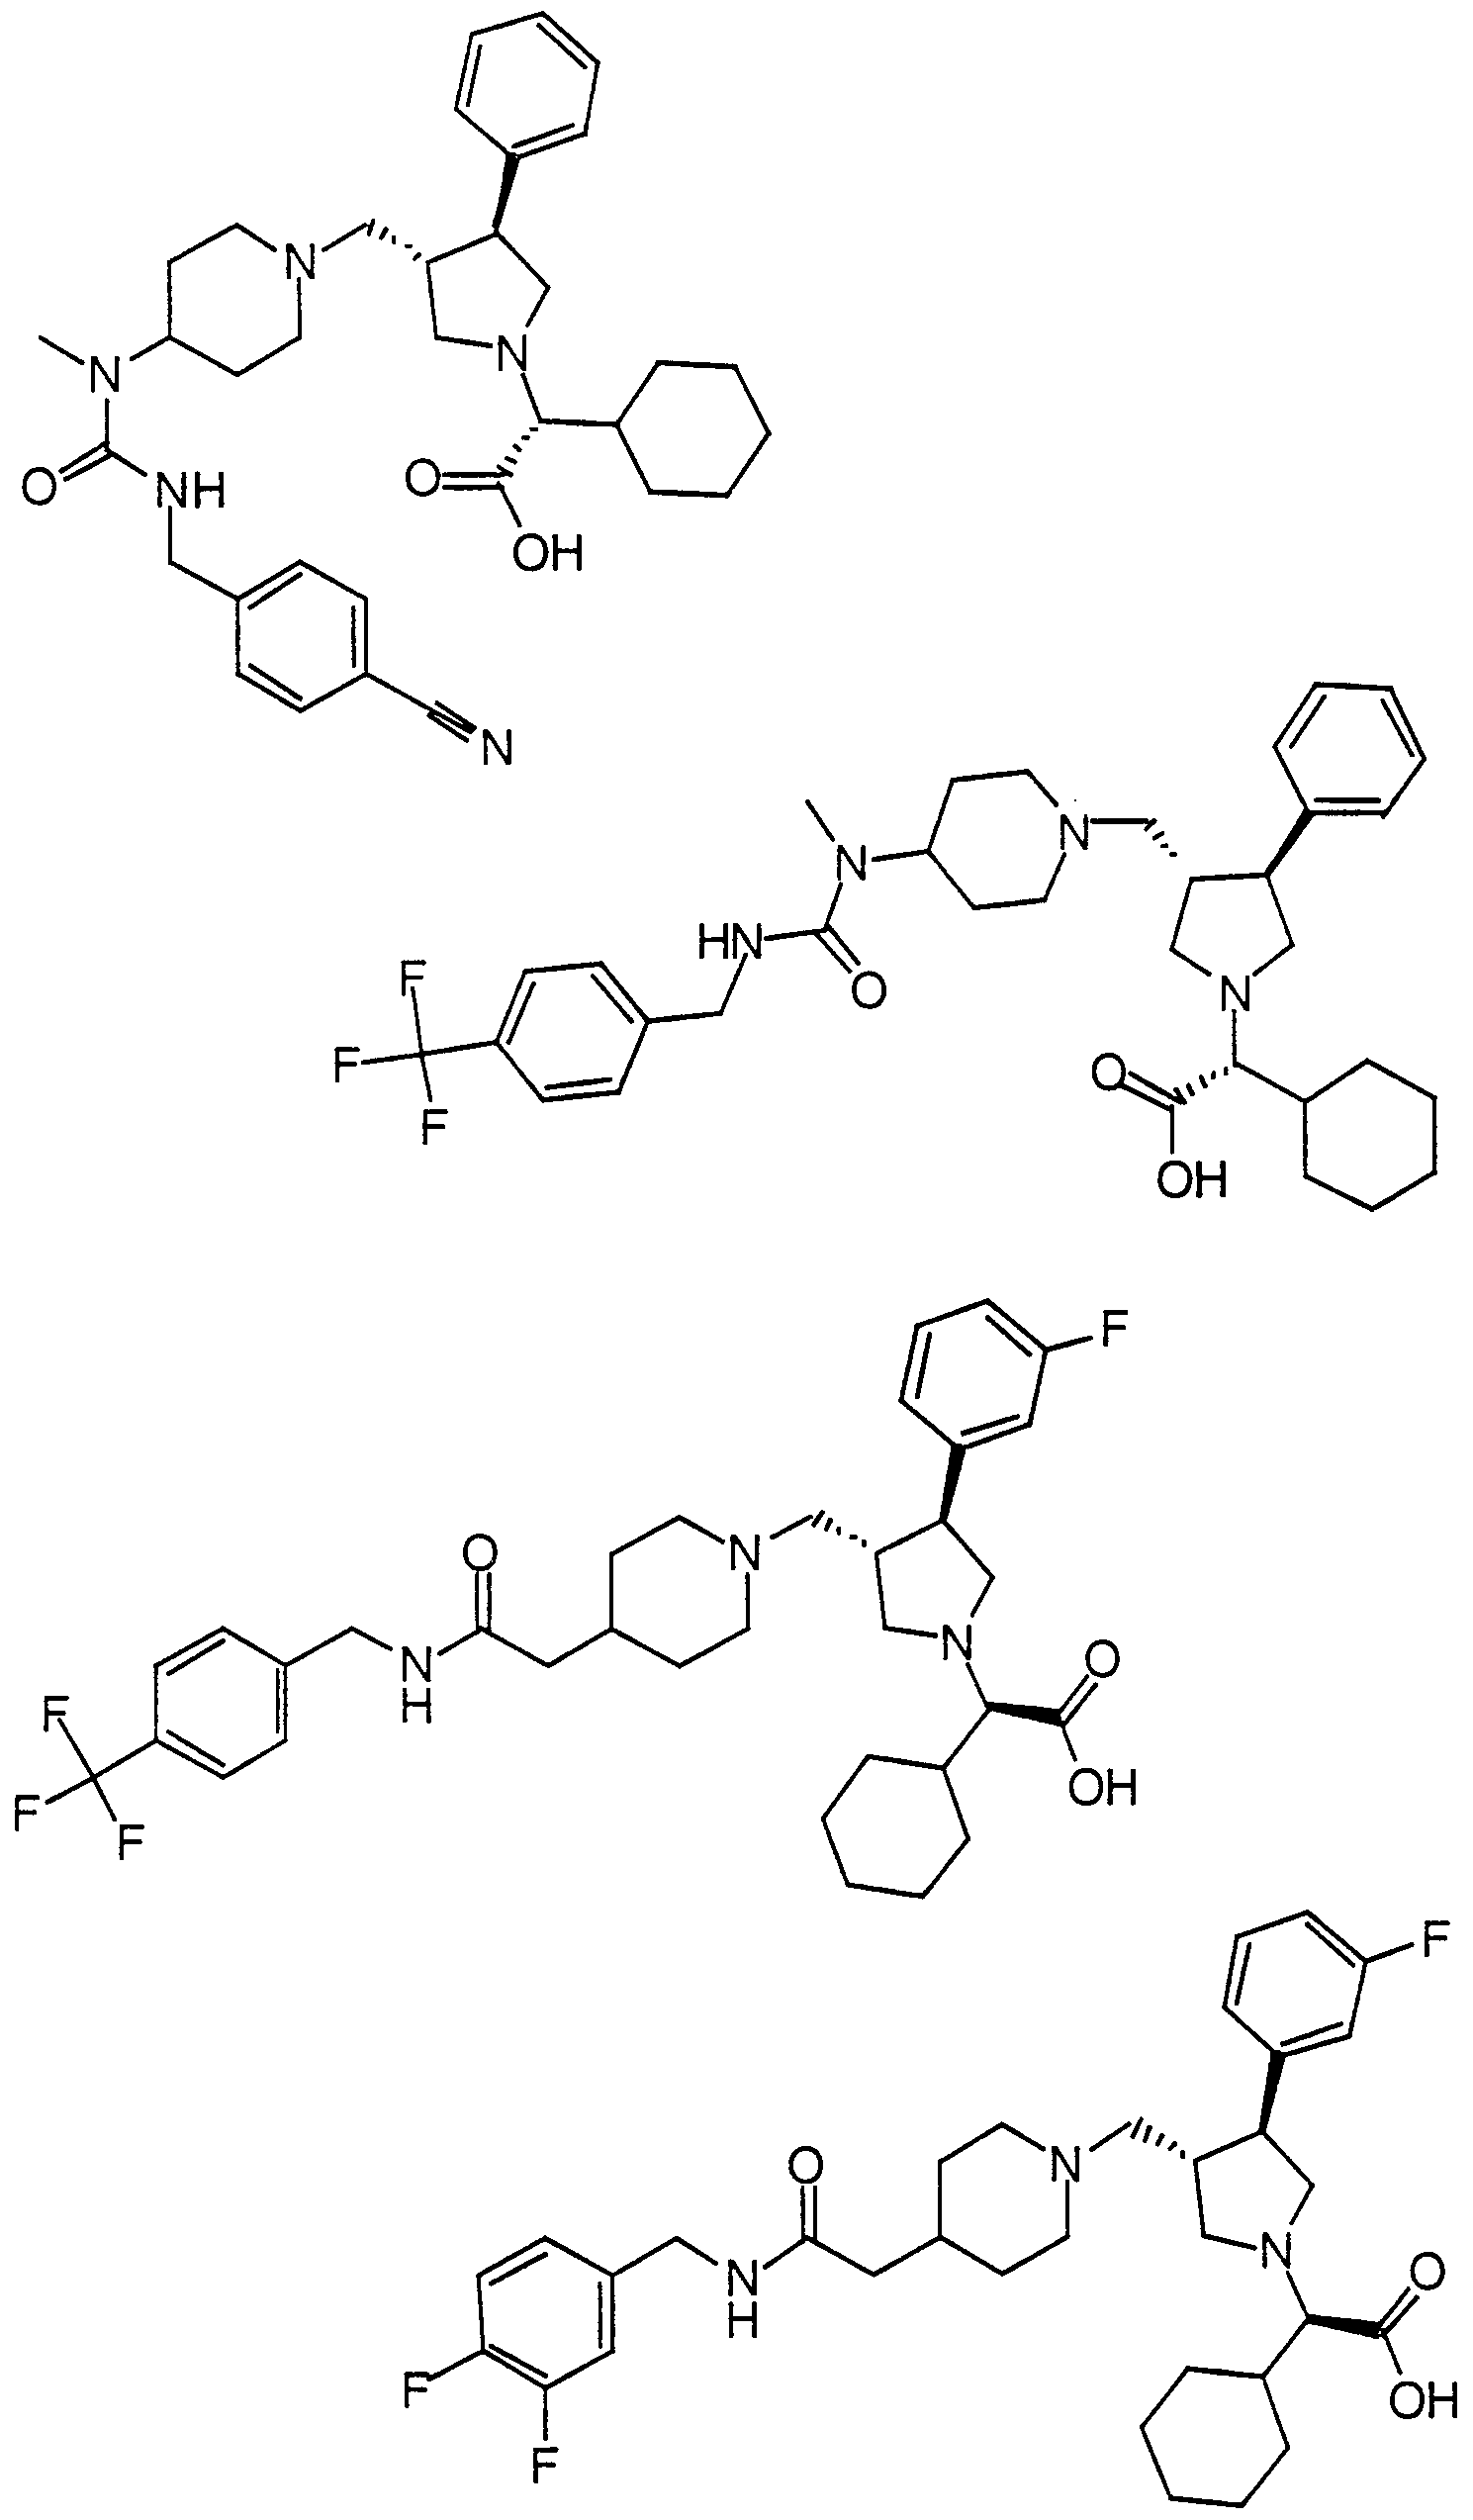 wo2000059497a1 pyrrolidine modulators of chemokine receptor Electrical Product Items figure imgf000038 0001